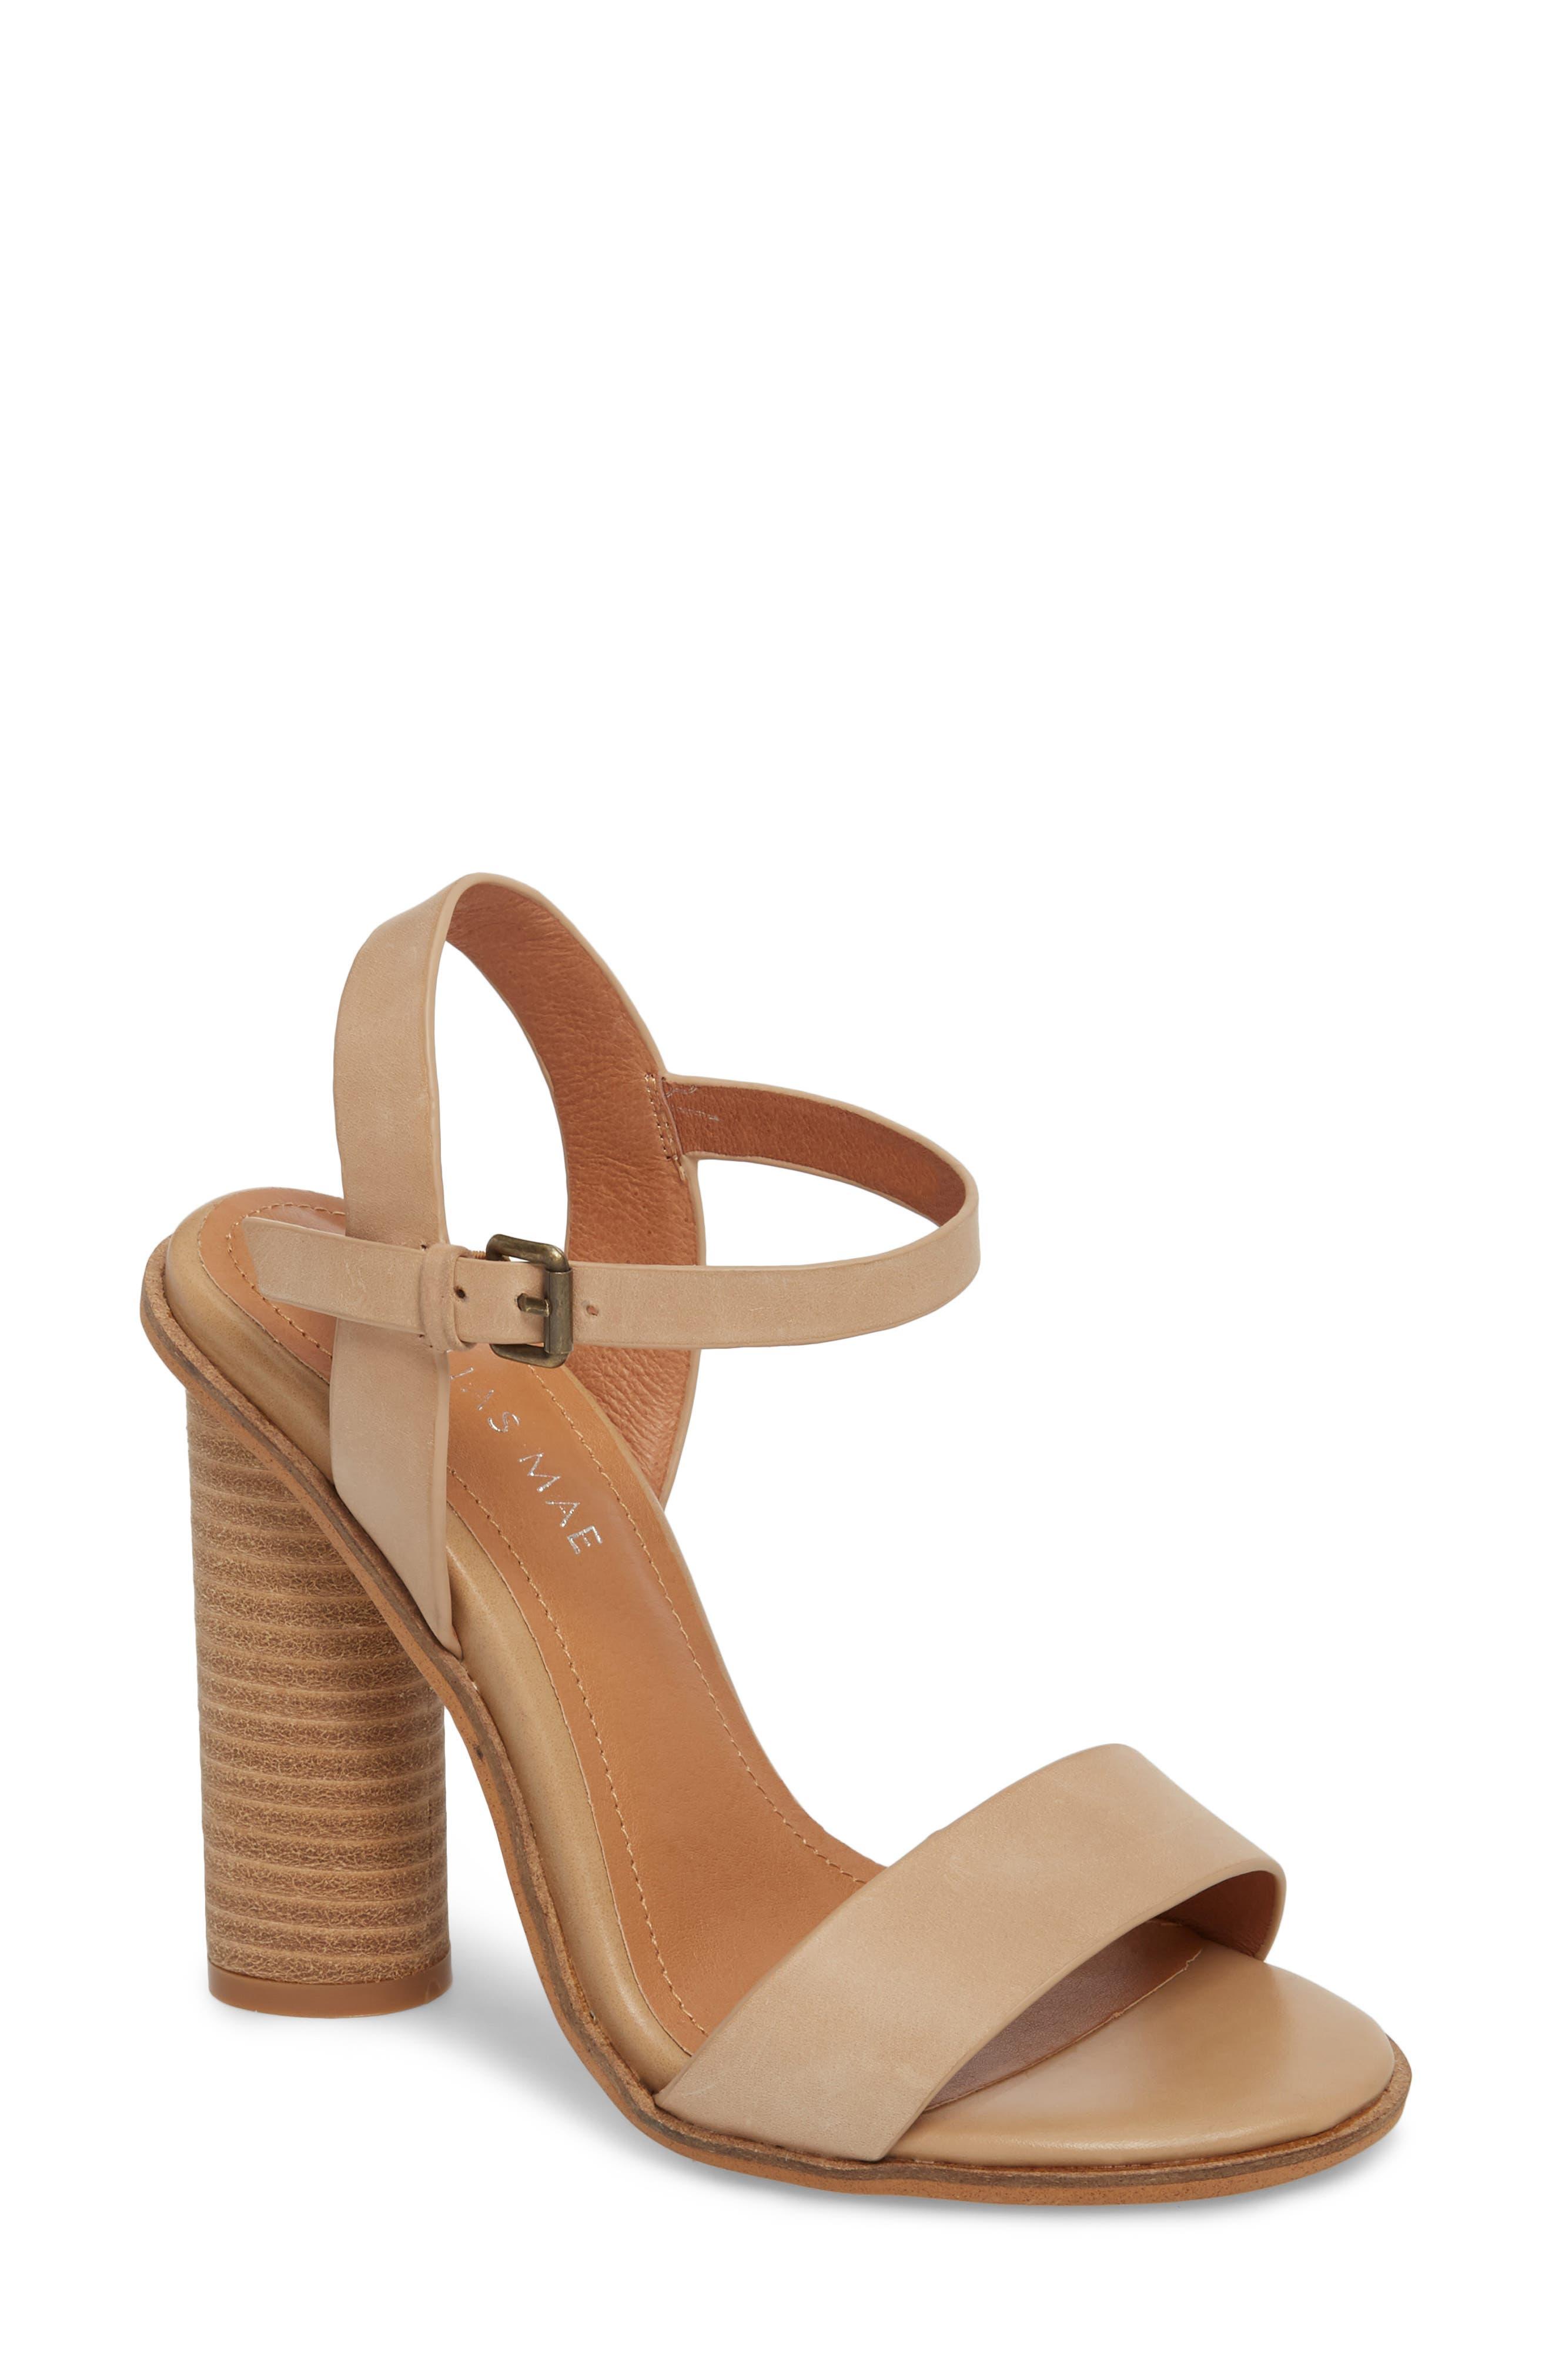 Abagail Sandal,                         Main,                         color, Natural Leather